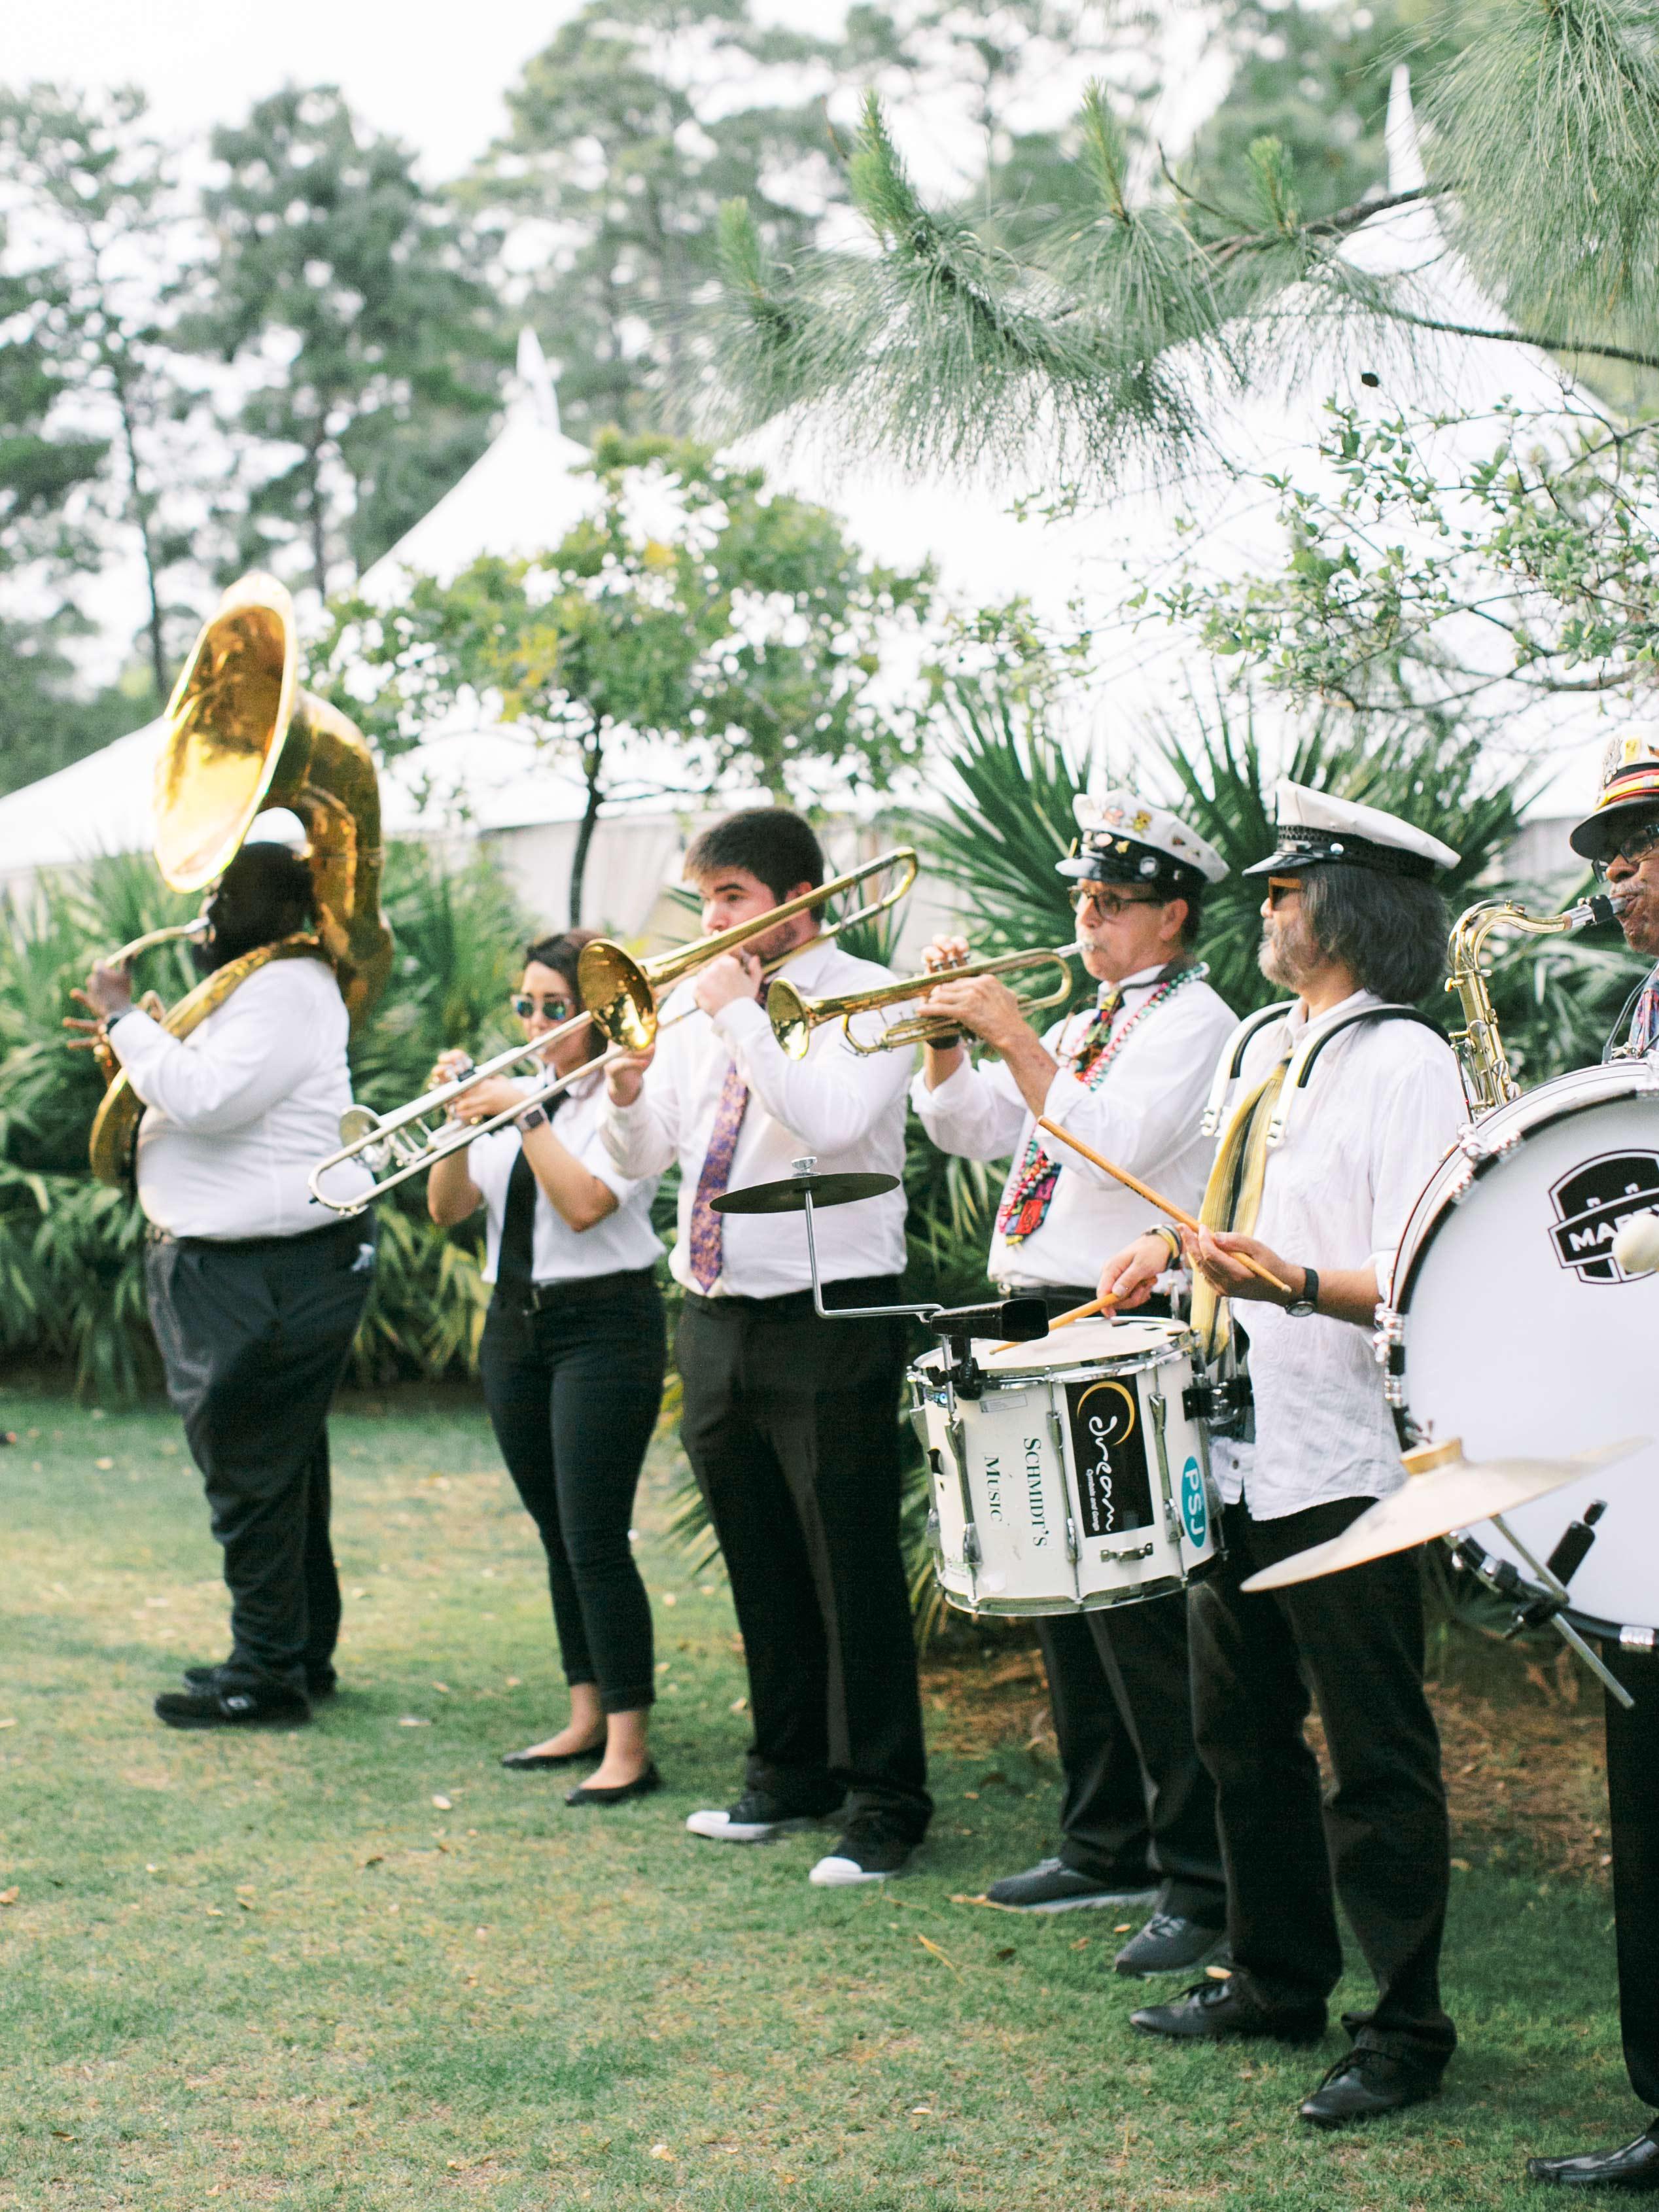 leighton craig wedding band playing on lawn